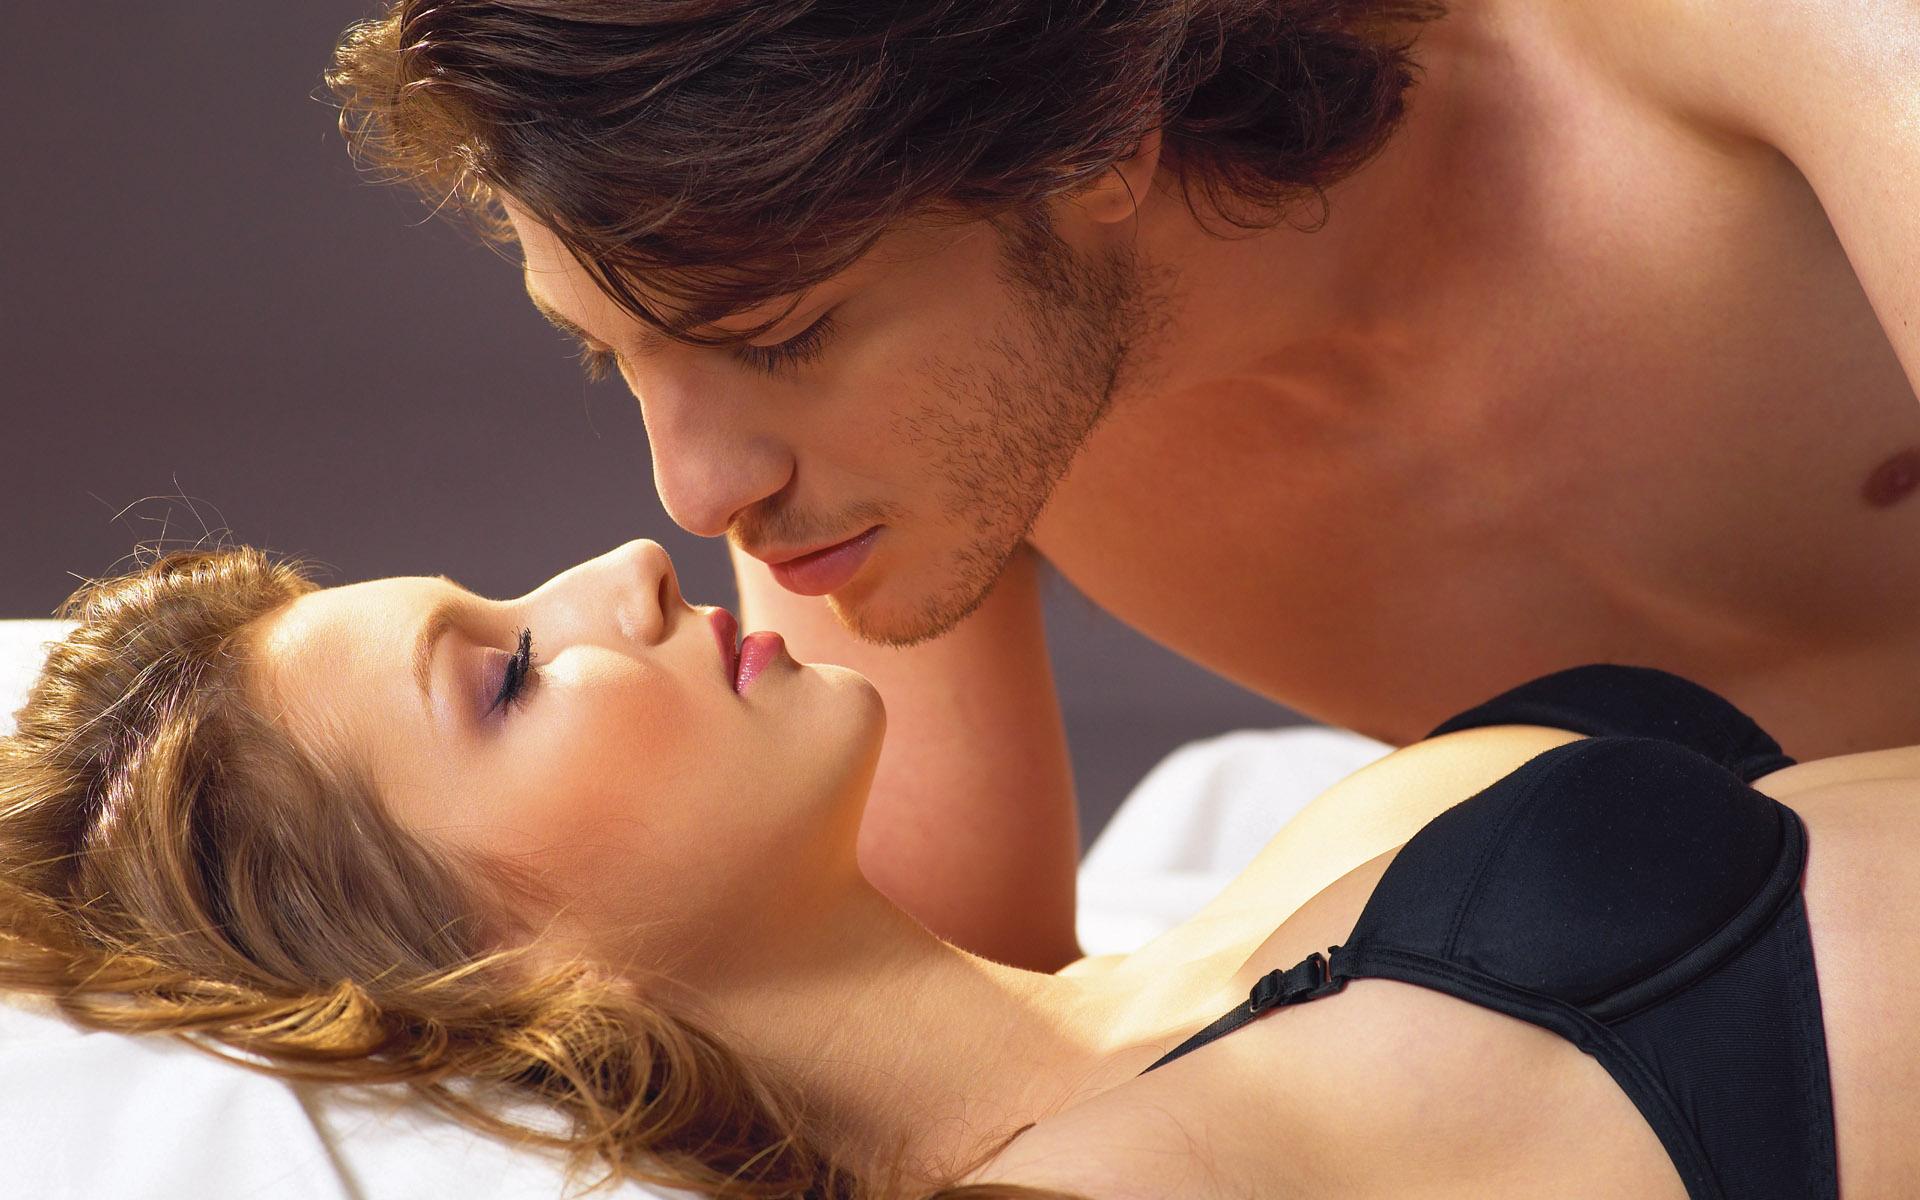 Mid Woman Seeking Dating Man Speed Singles Affair Kinky